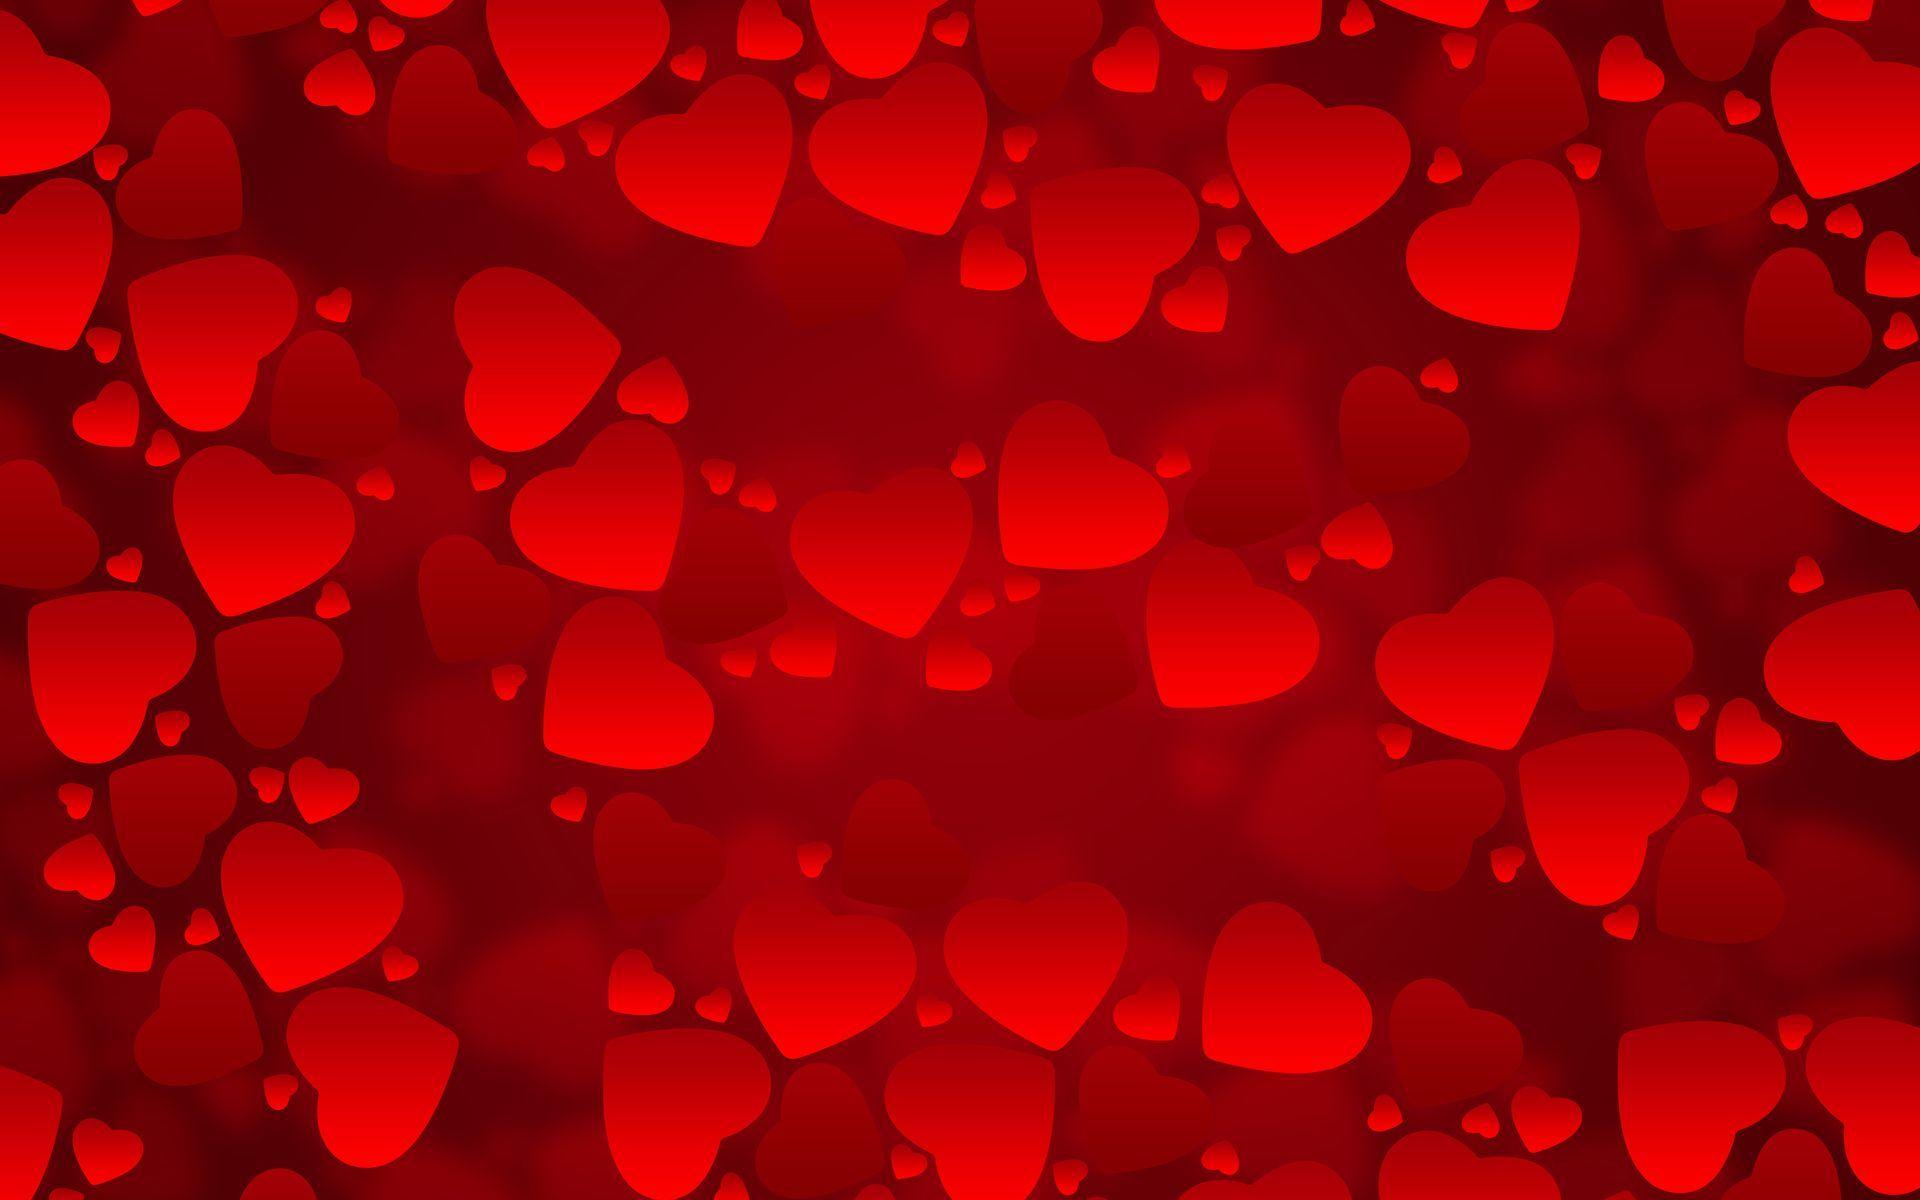 love heart wallpapers hd wallpaper cave | hearts ♥ l♥ve